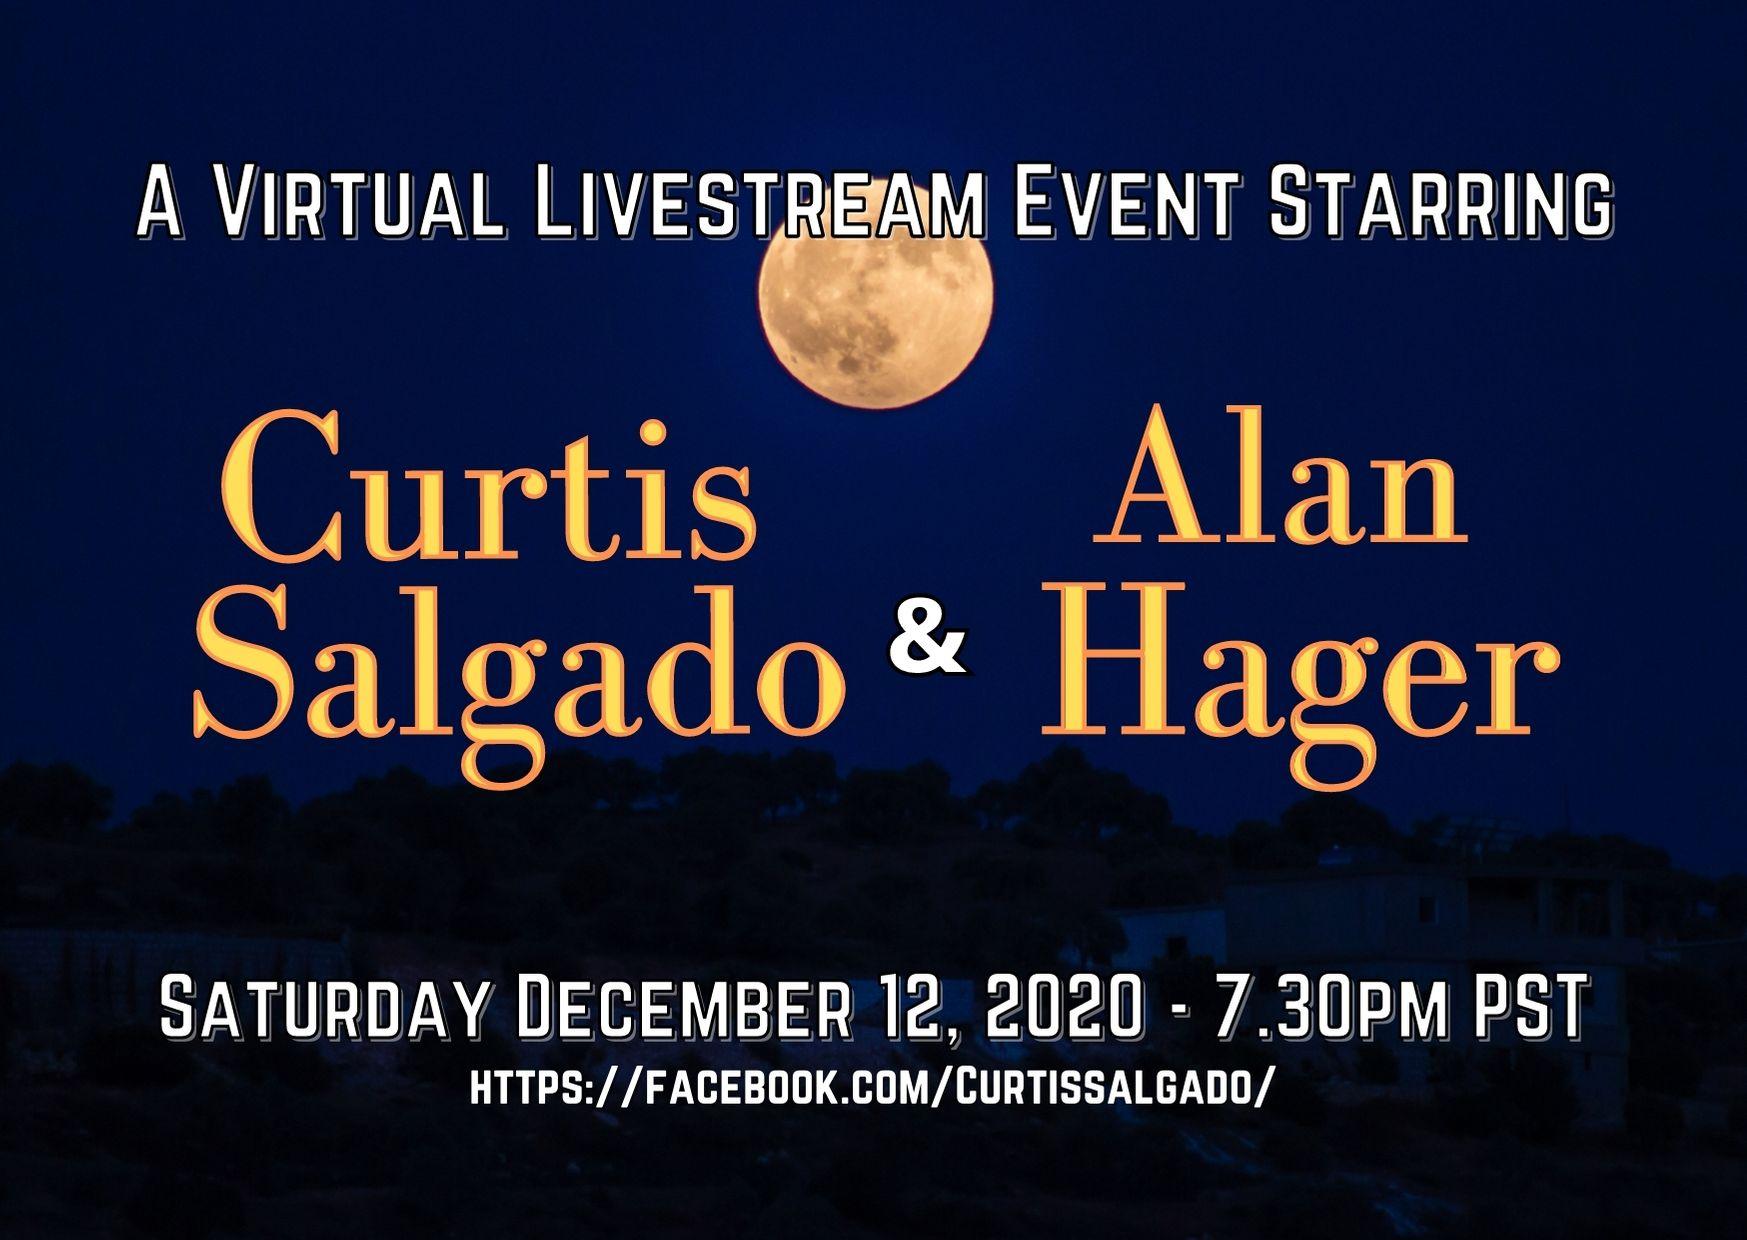 A VIRTUAL LIVE STREAMING EVENT STARRING Curtis Salgado & Alan Hager Saturday December 12, 2020 - 7.30pm PST